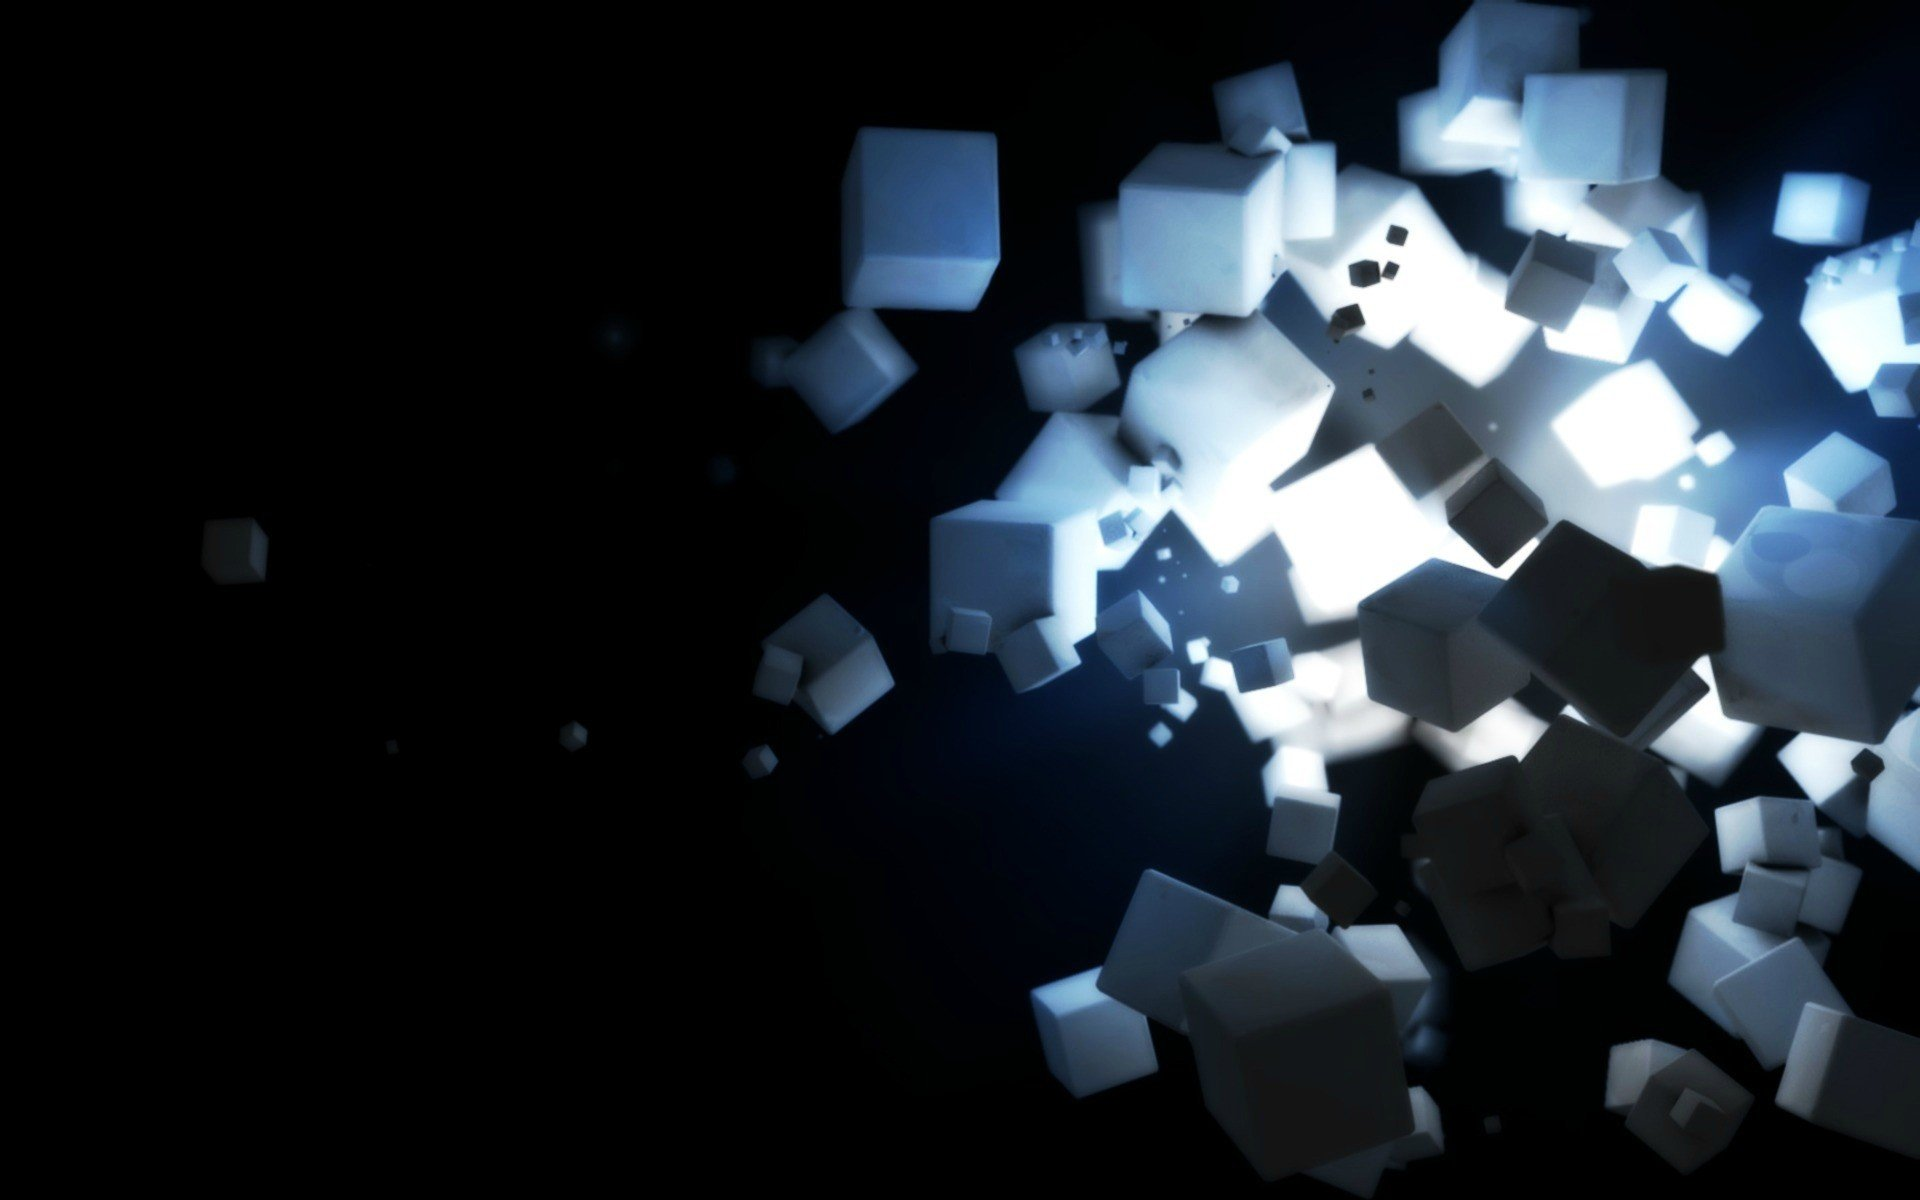 1080p High Definition Wallpapers For Desktop 171